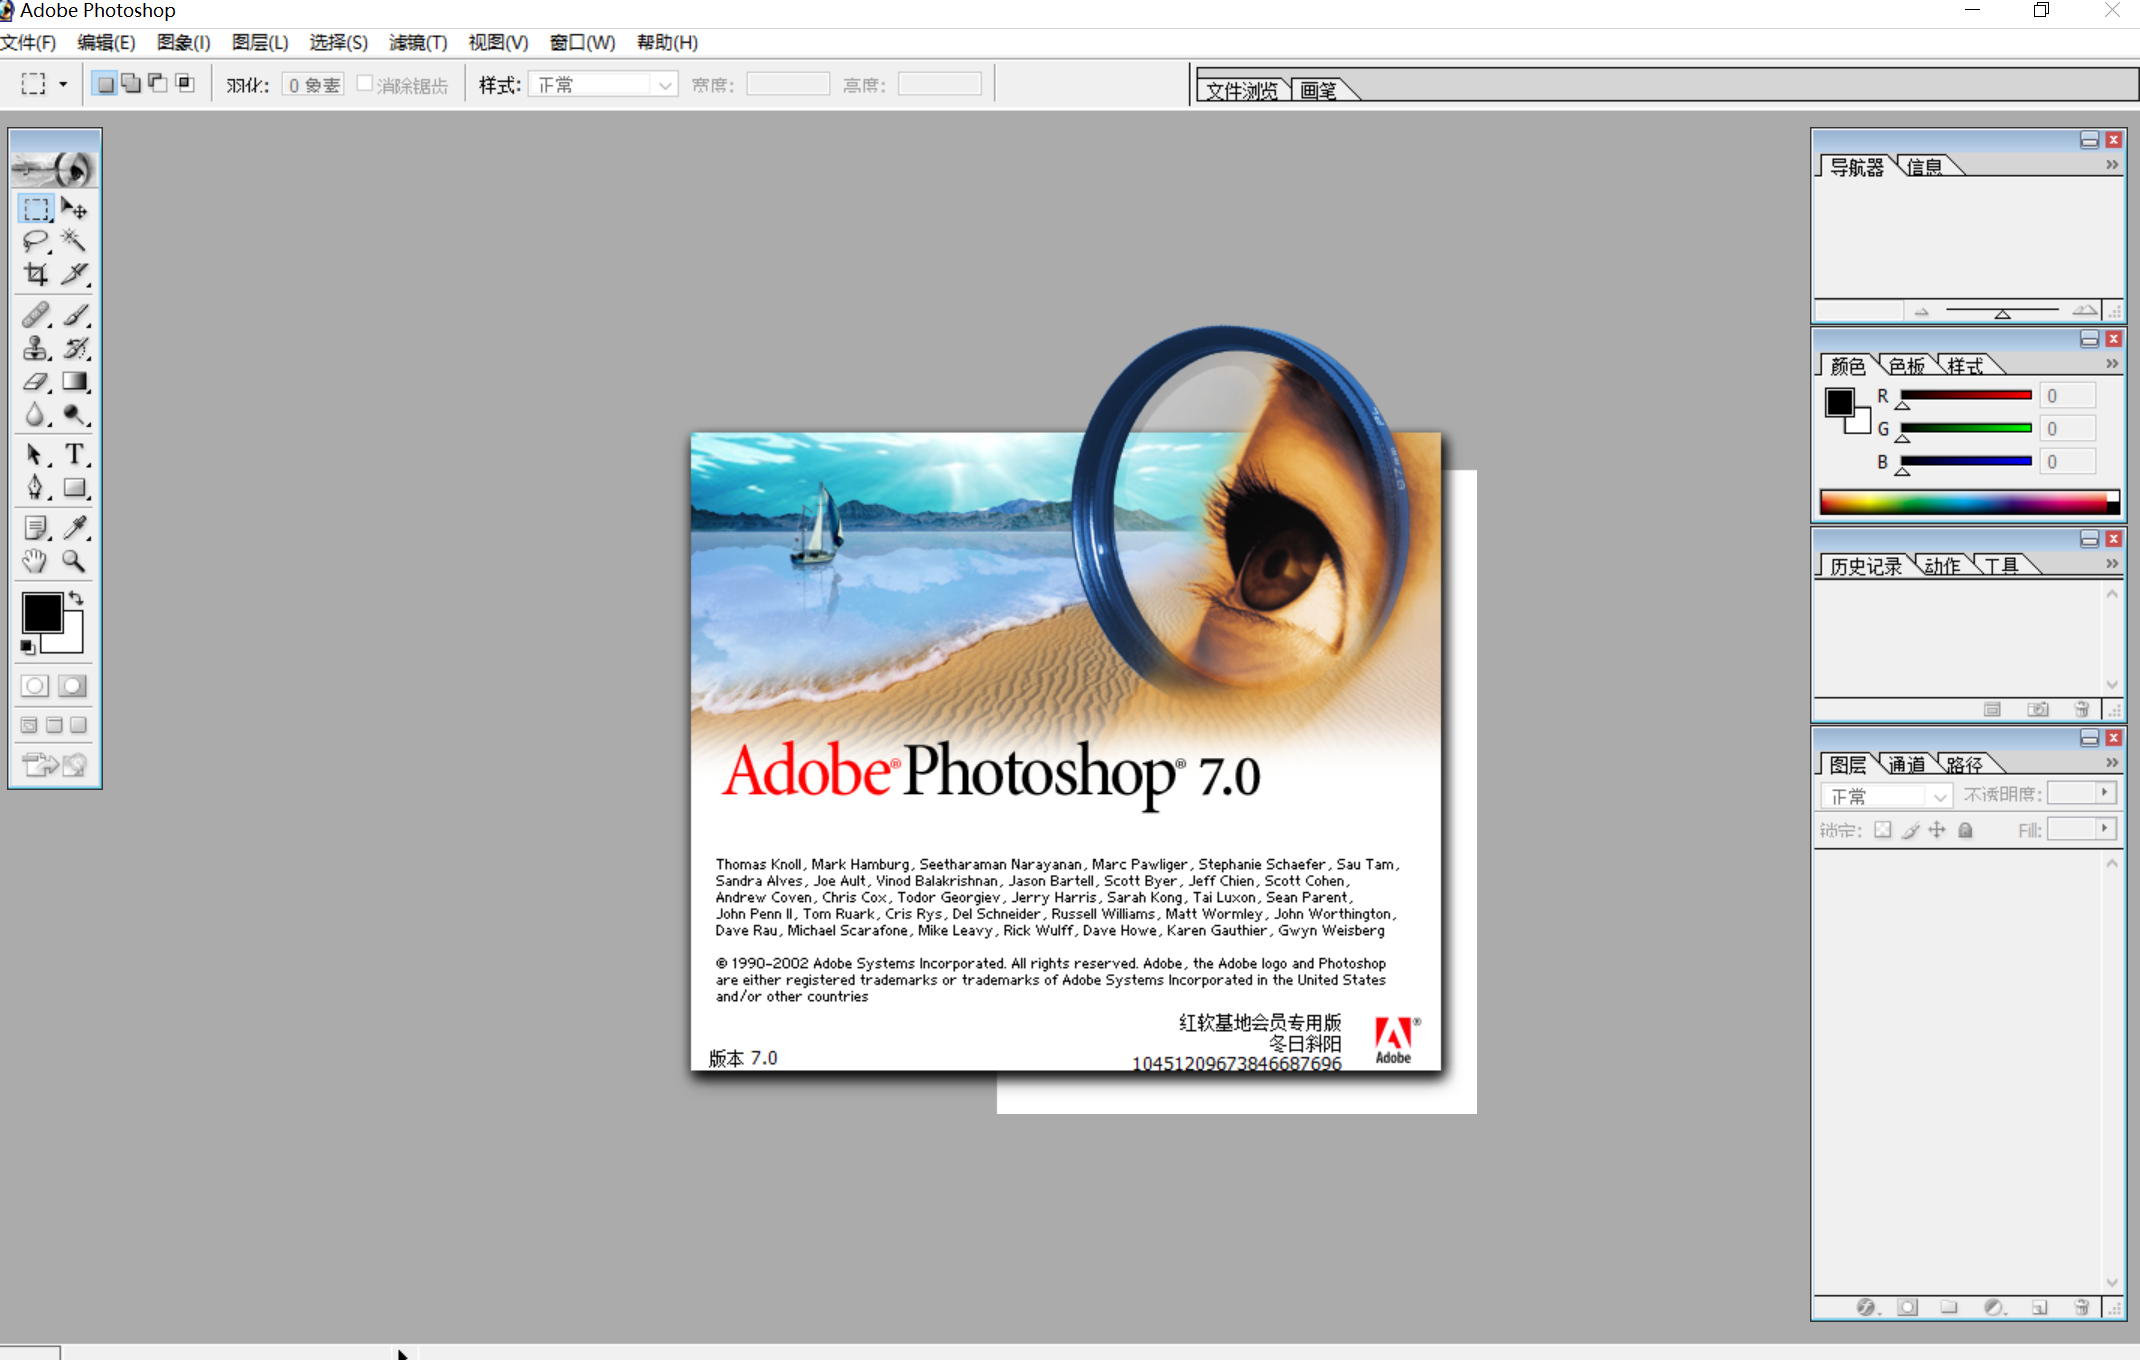 Photoshop 单文件便携版 v7.0 + CS6